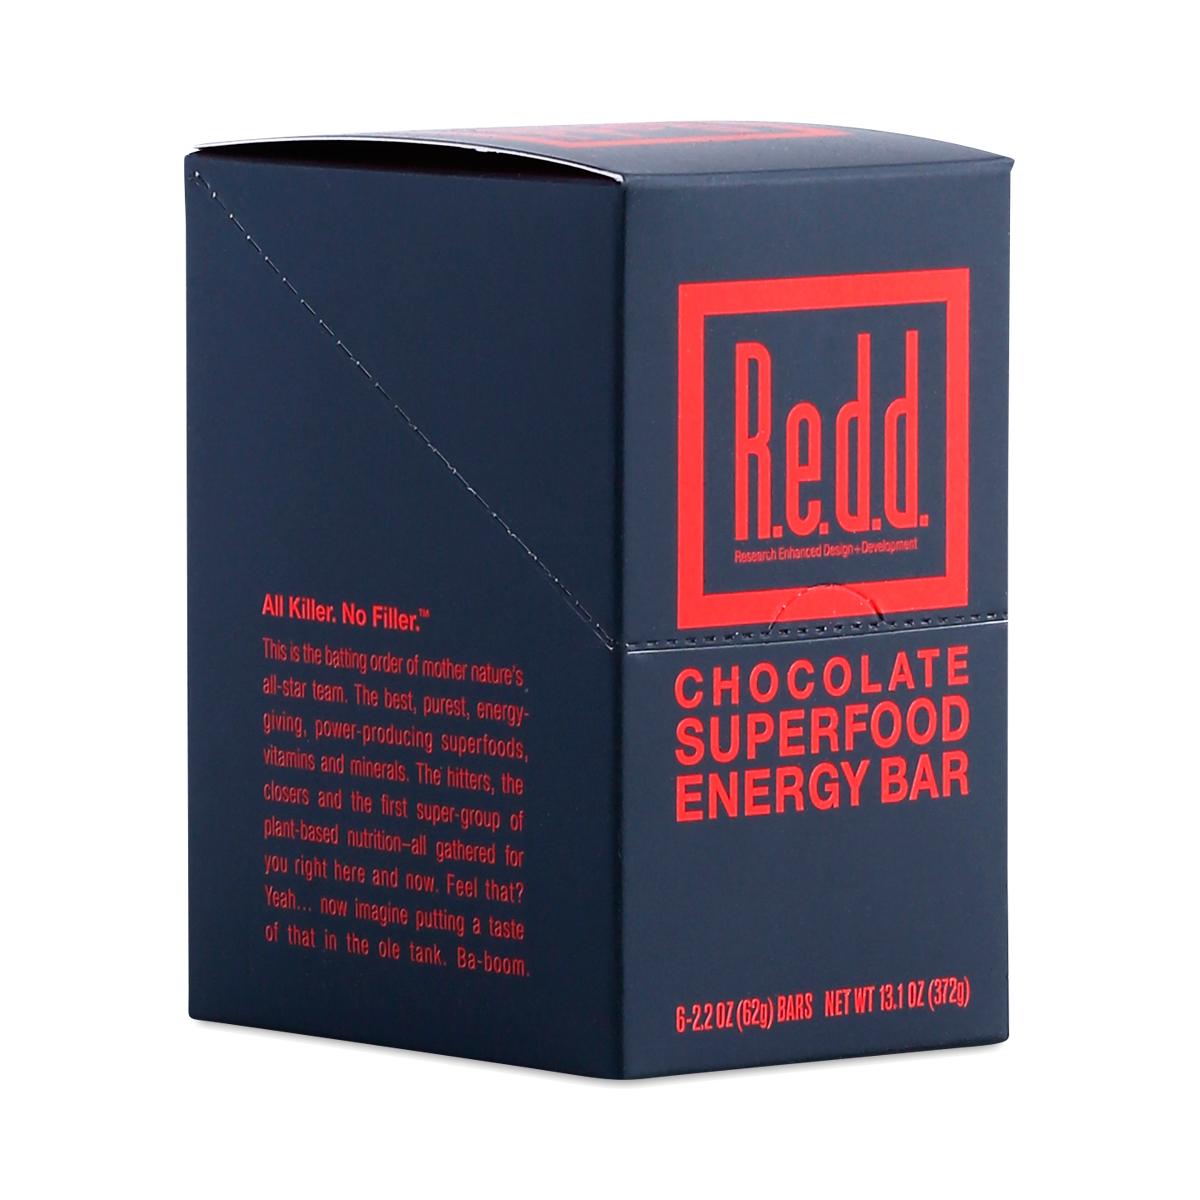 Redd Chocolate Superfood Energy Bar six 2.2 oz bars